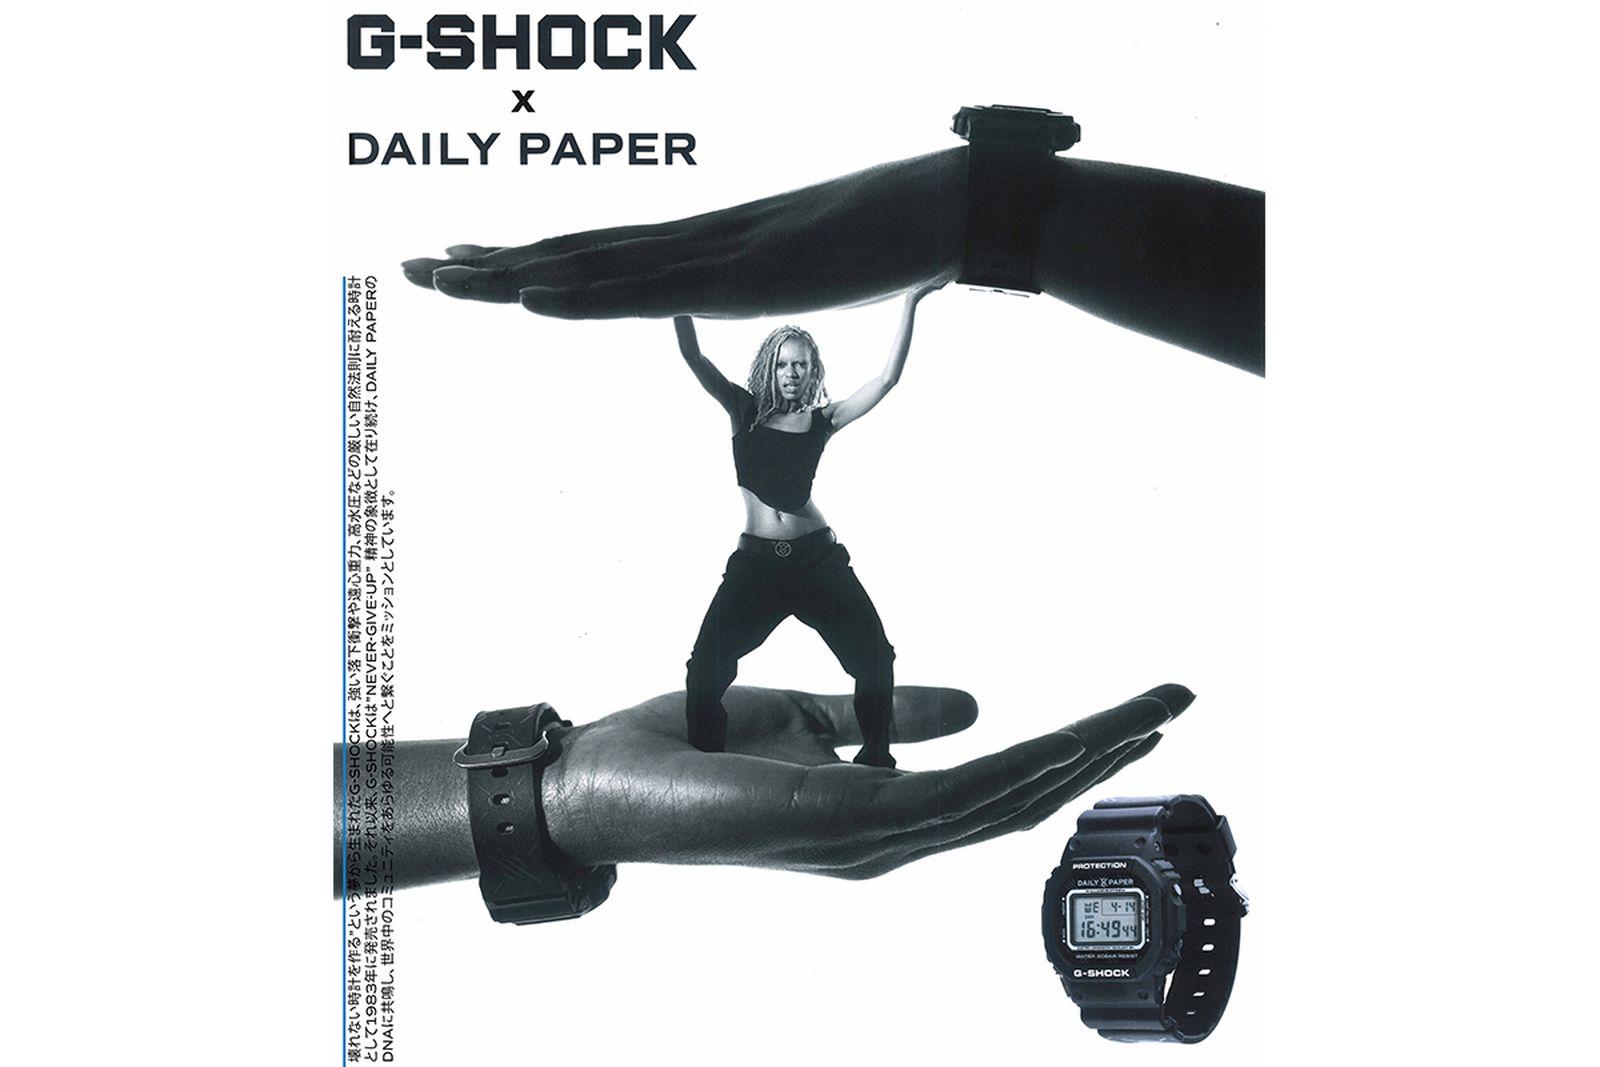 gshock-dailypaper-3